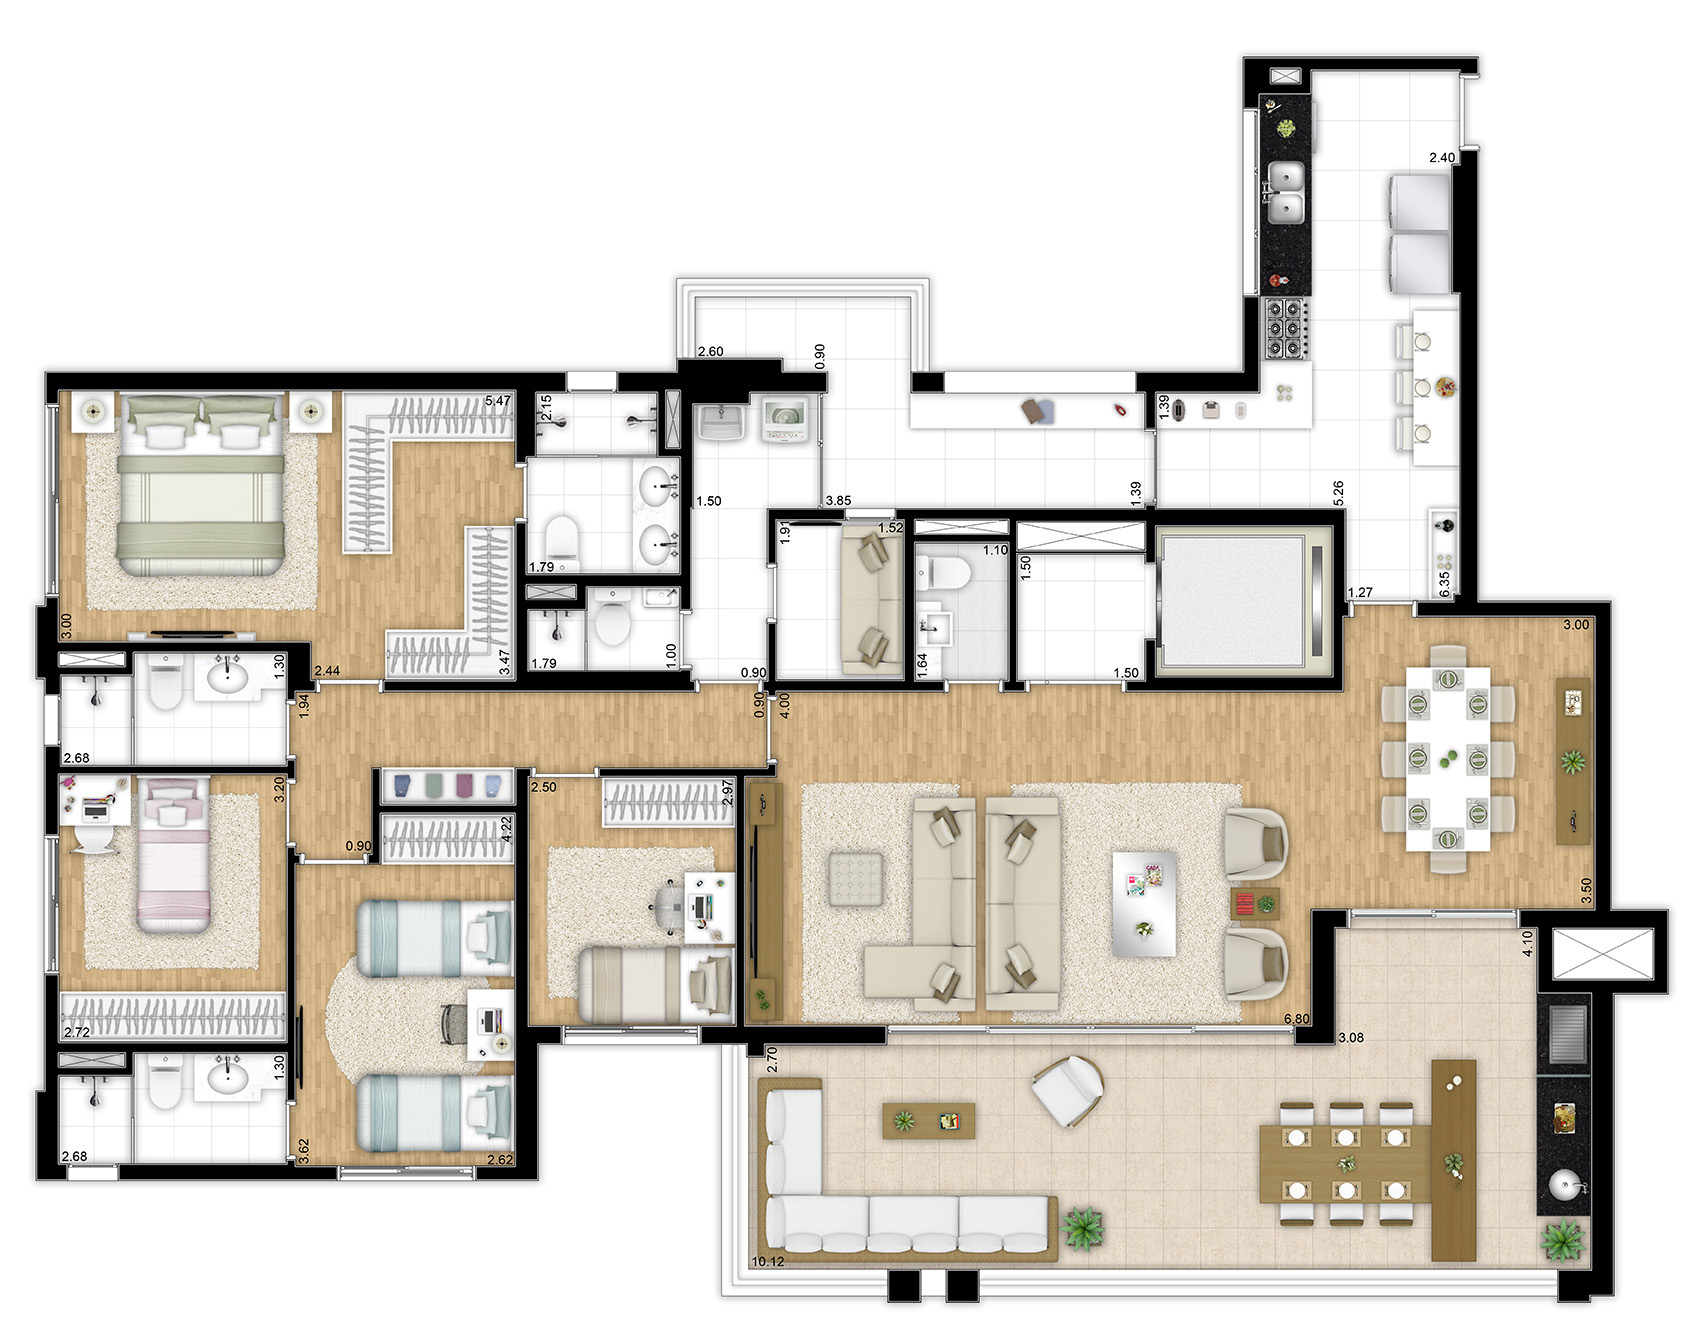 197 m² - 4 dormitórios